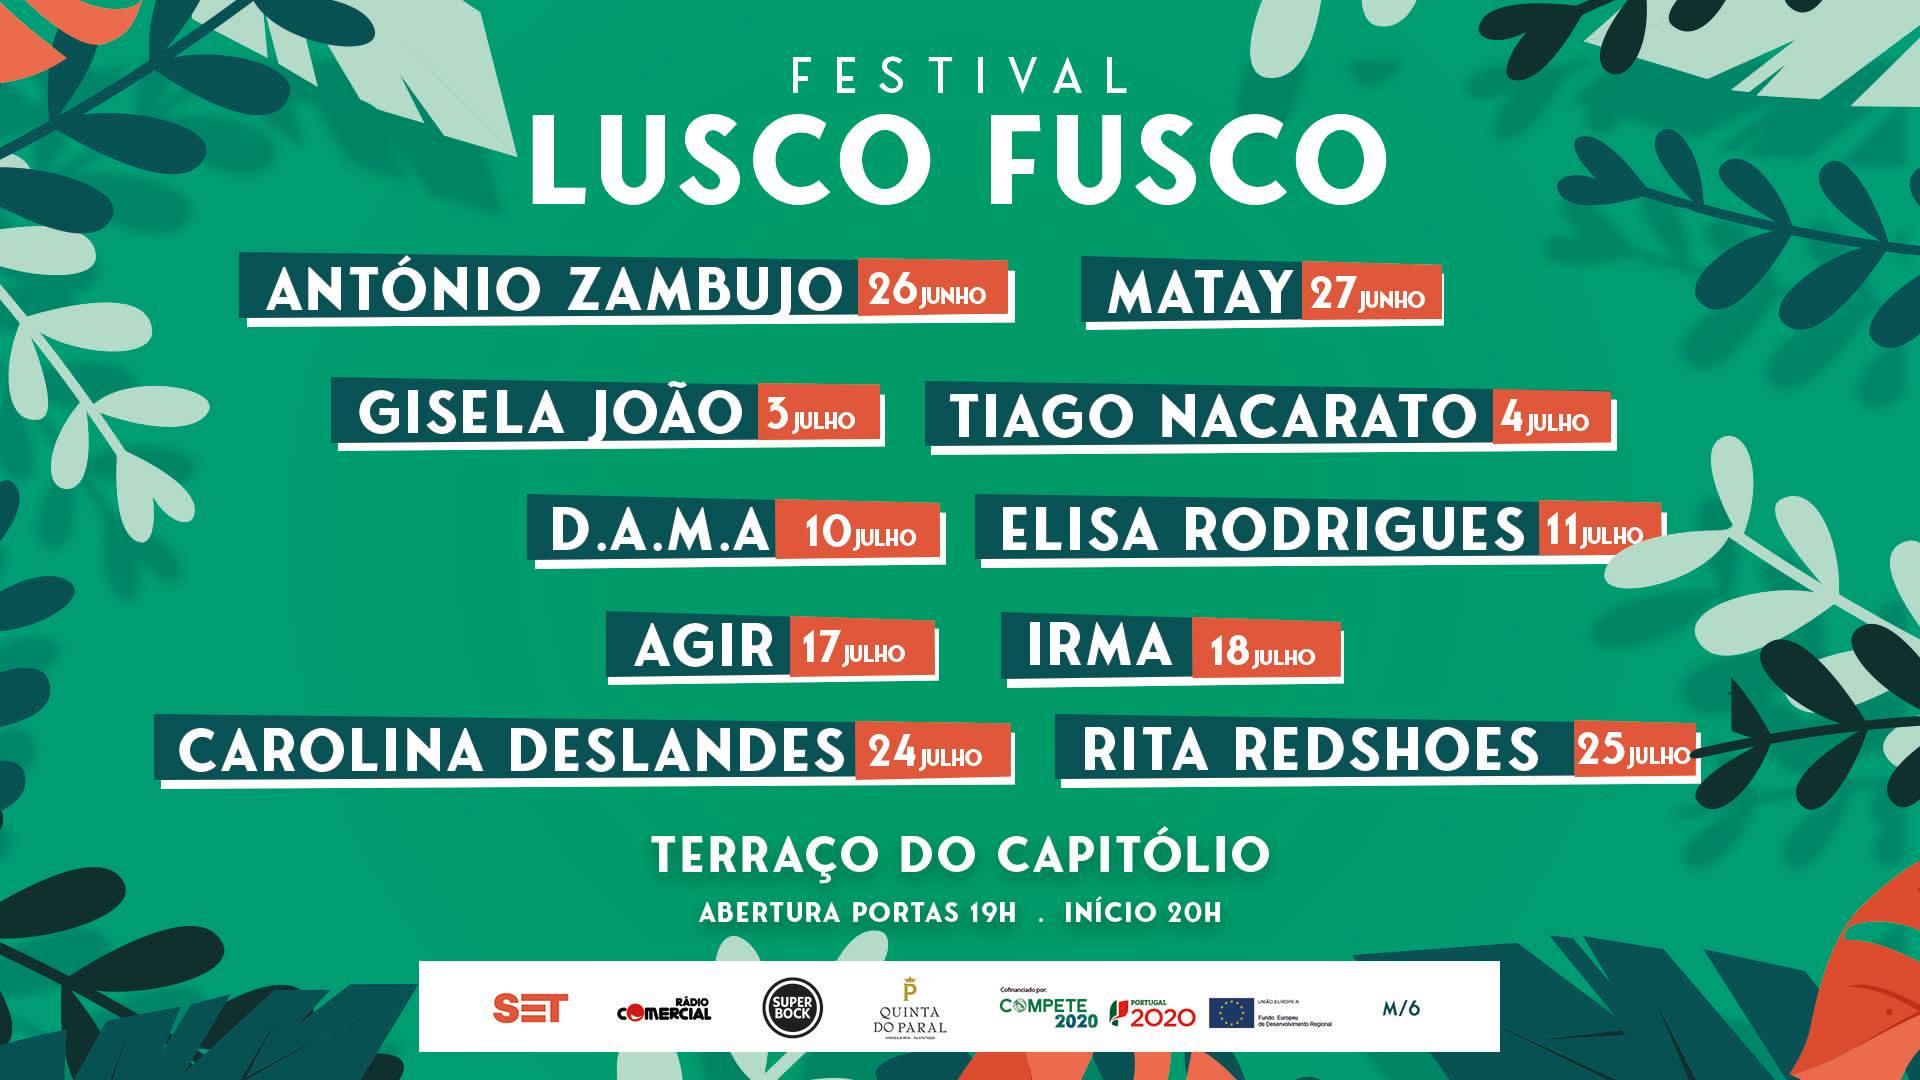 Festival Lusco Fusco